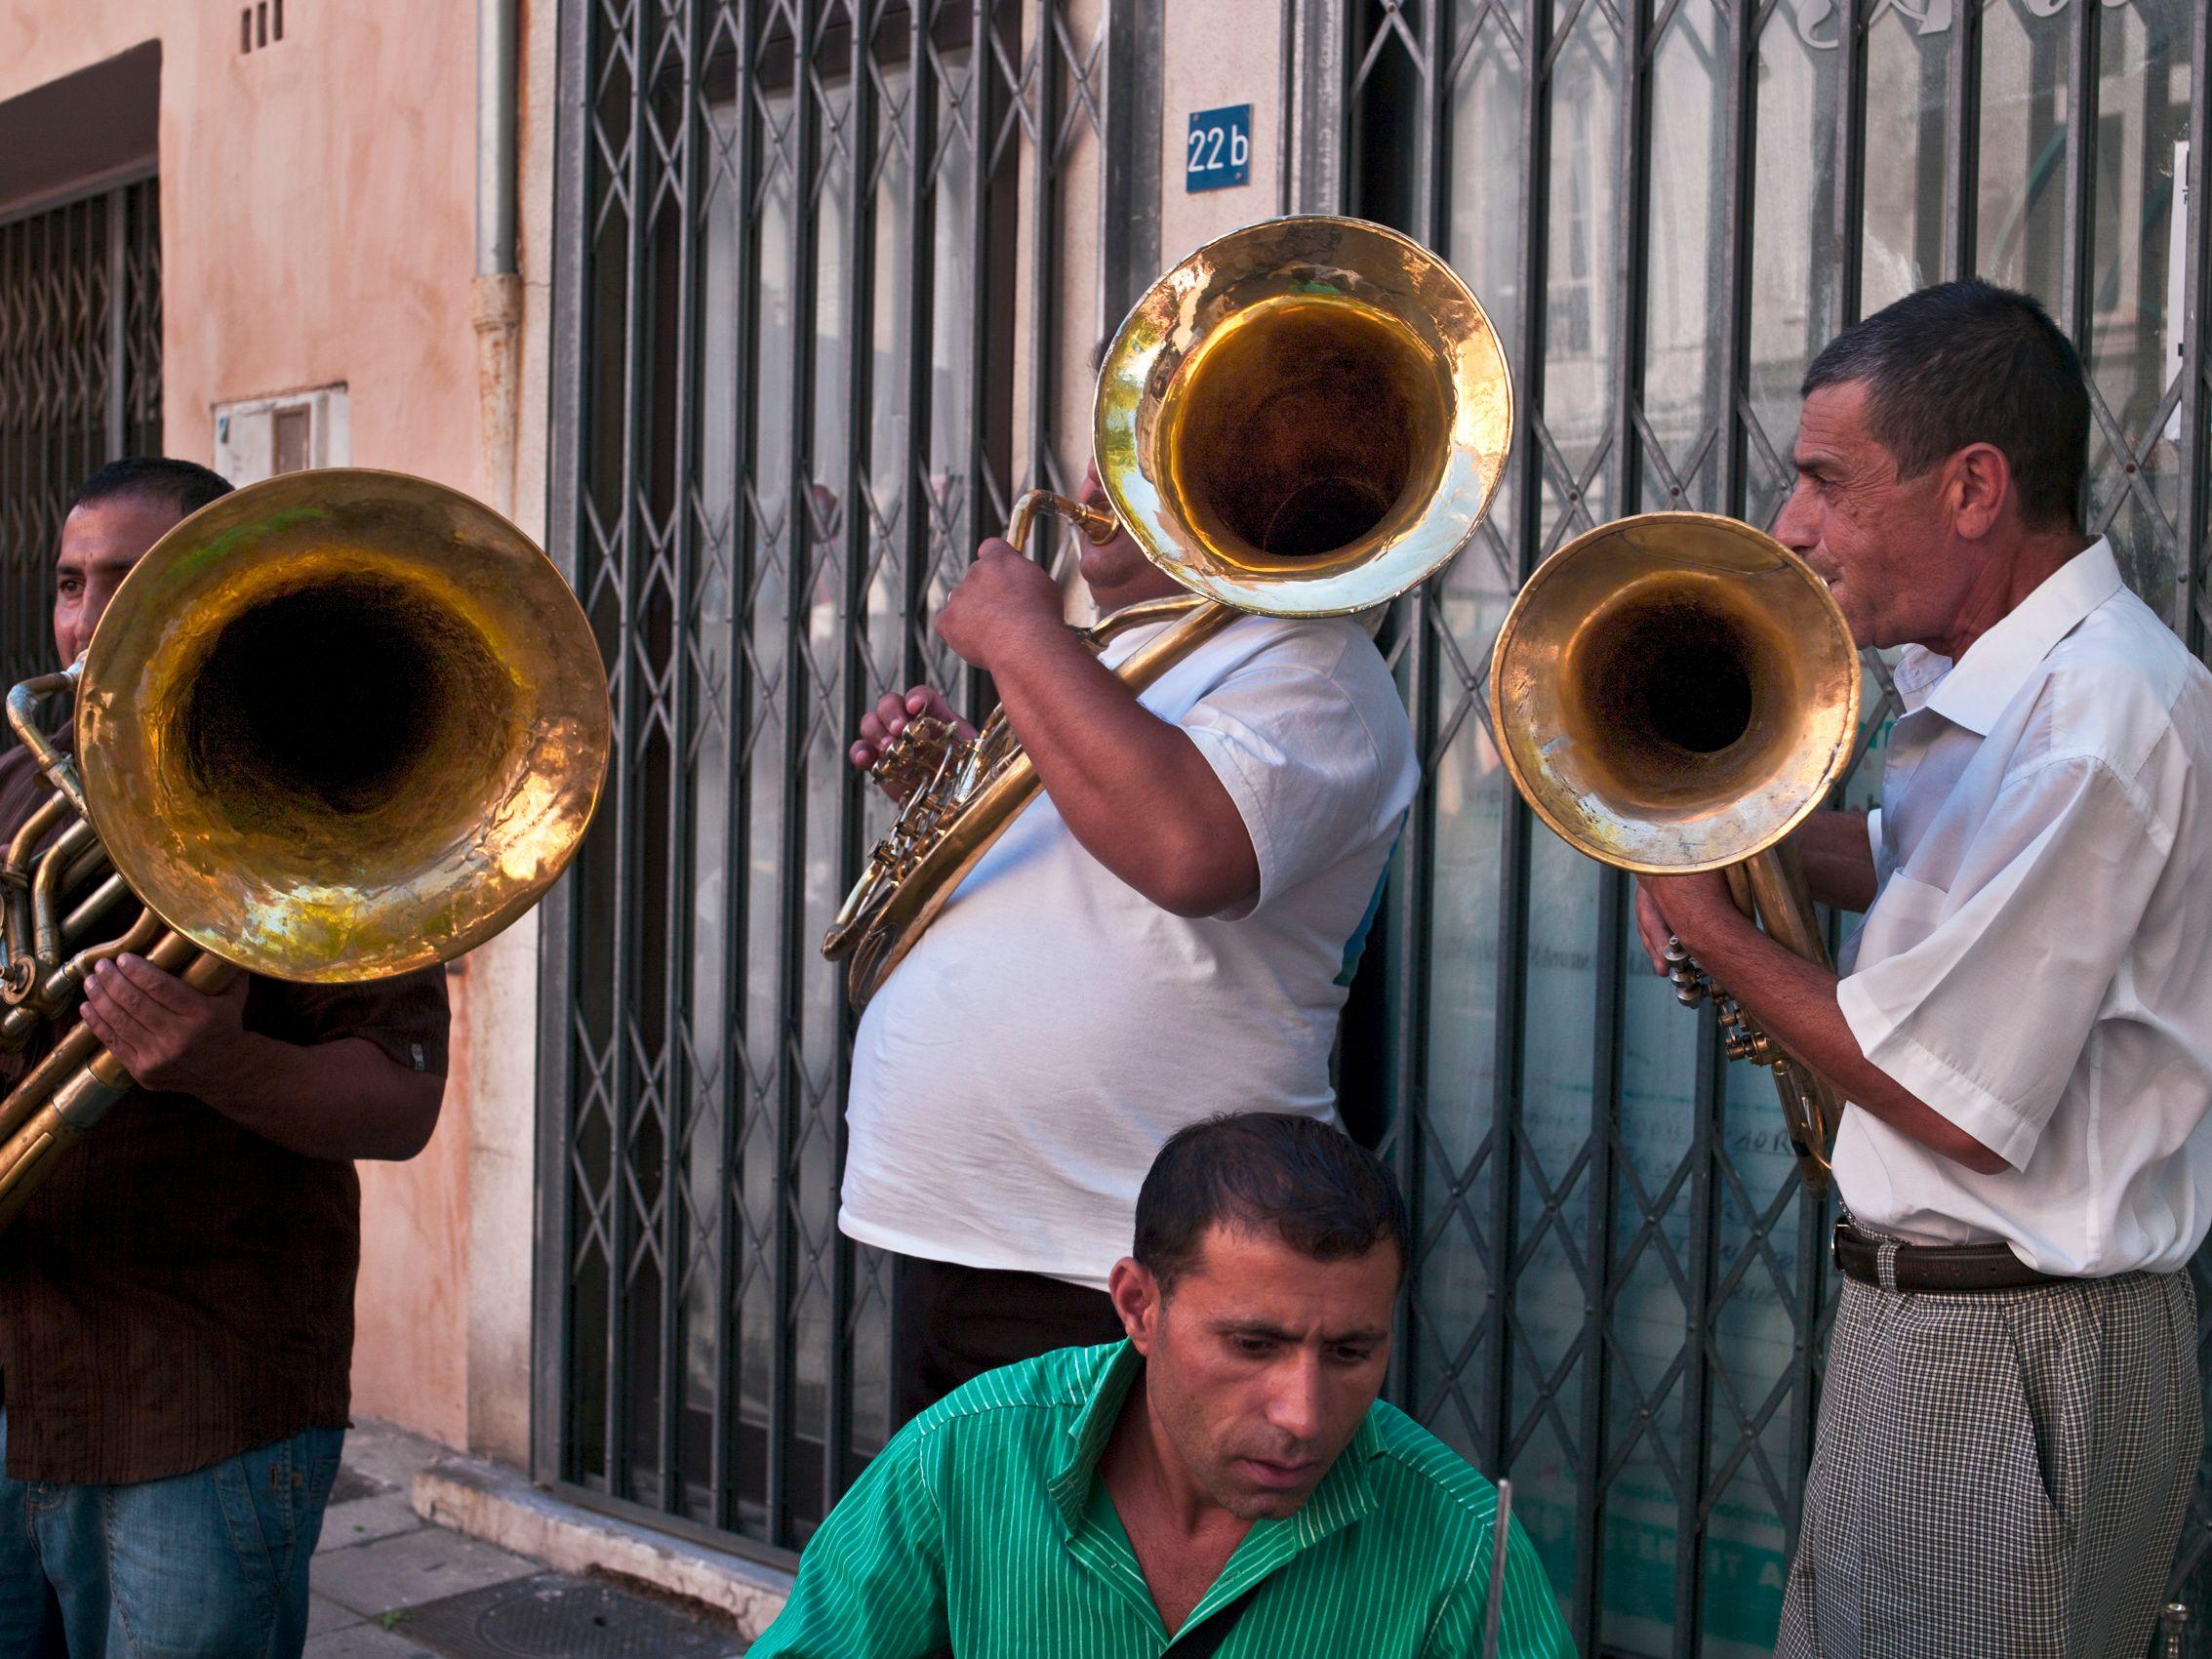 Three Horns, Arles France